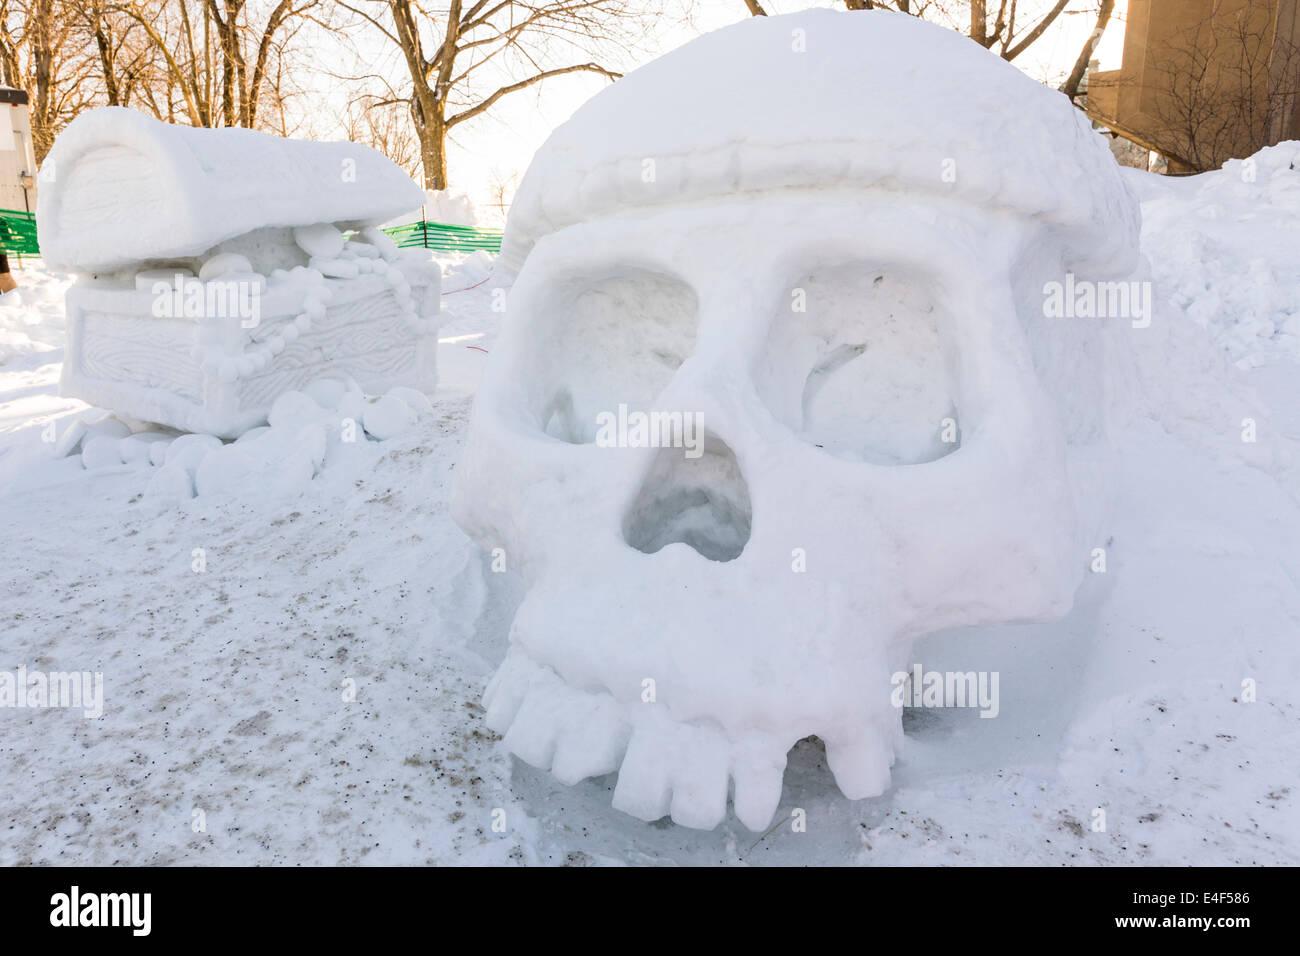 Ice sculpture, Quebec Winter Carnival, Quebec City, Quebec, Canada - Stock Image